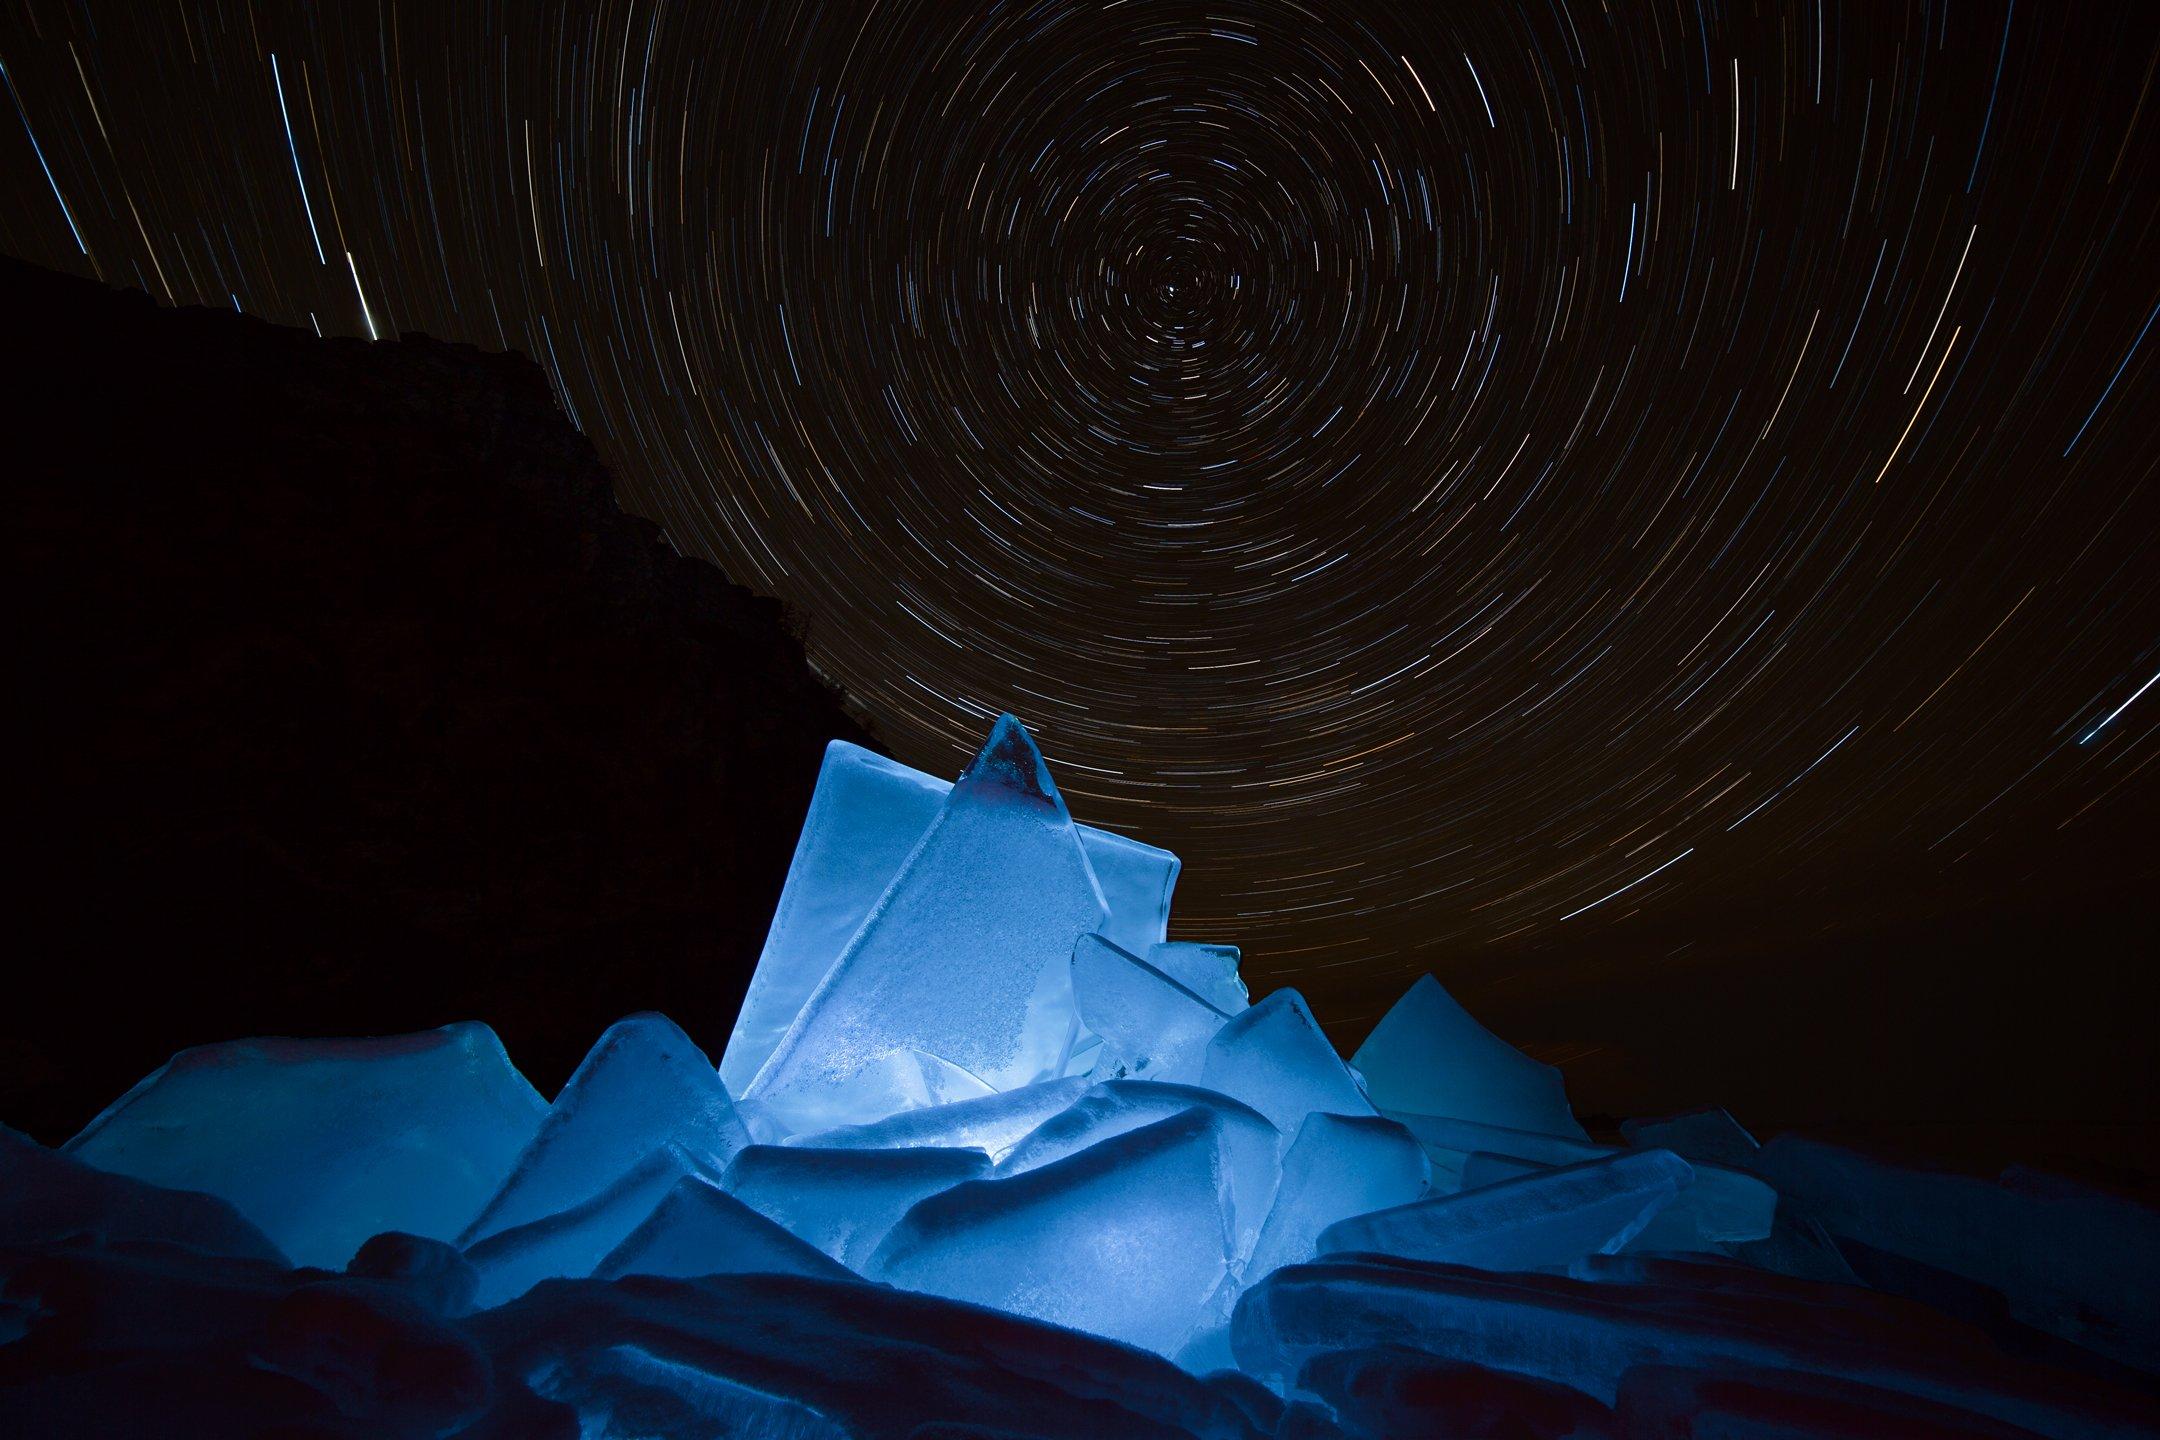 лед, байкал, ночь, зима, холод, звезды, треки, волшебство, магия, путешествия, антон селезнев, Антон Селезнев